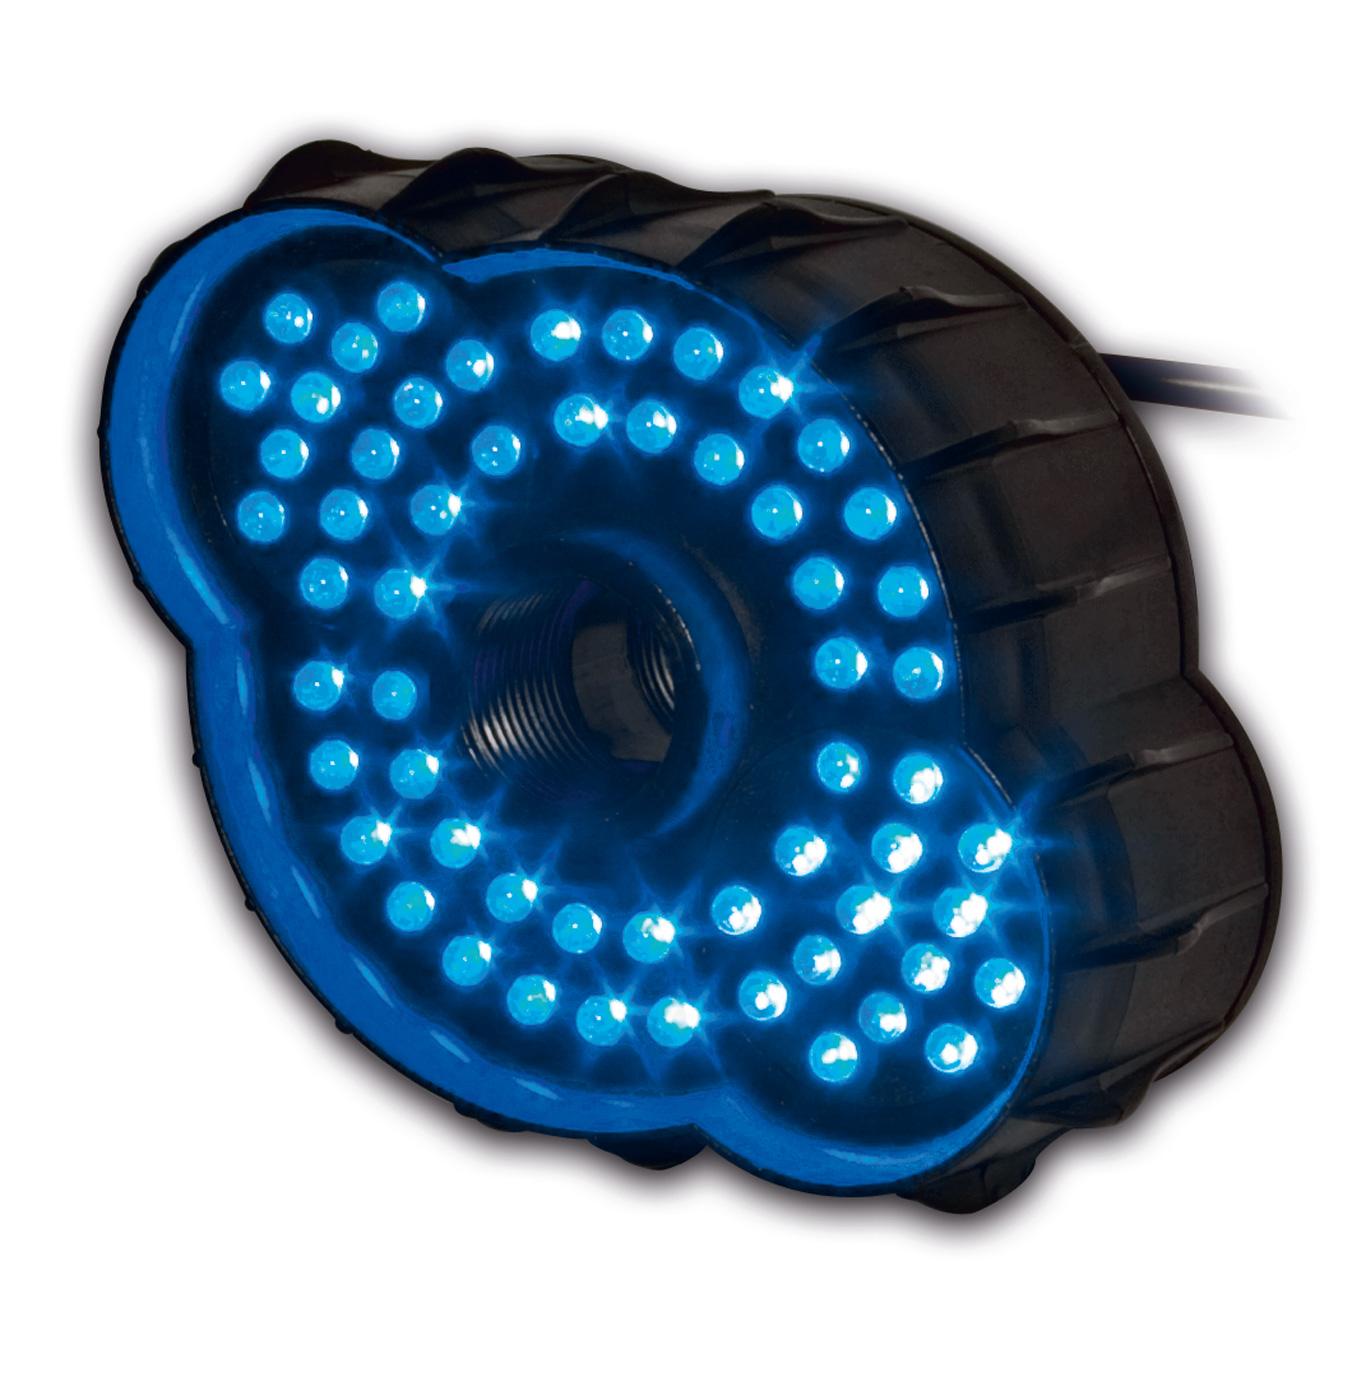 Fontänenbeleuchtung LEDPond P-58 (58LEDs/12V), blau